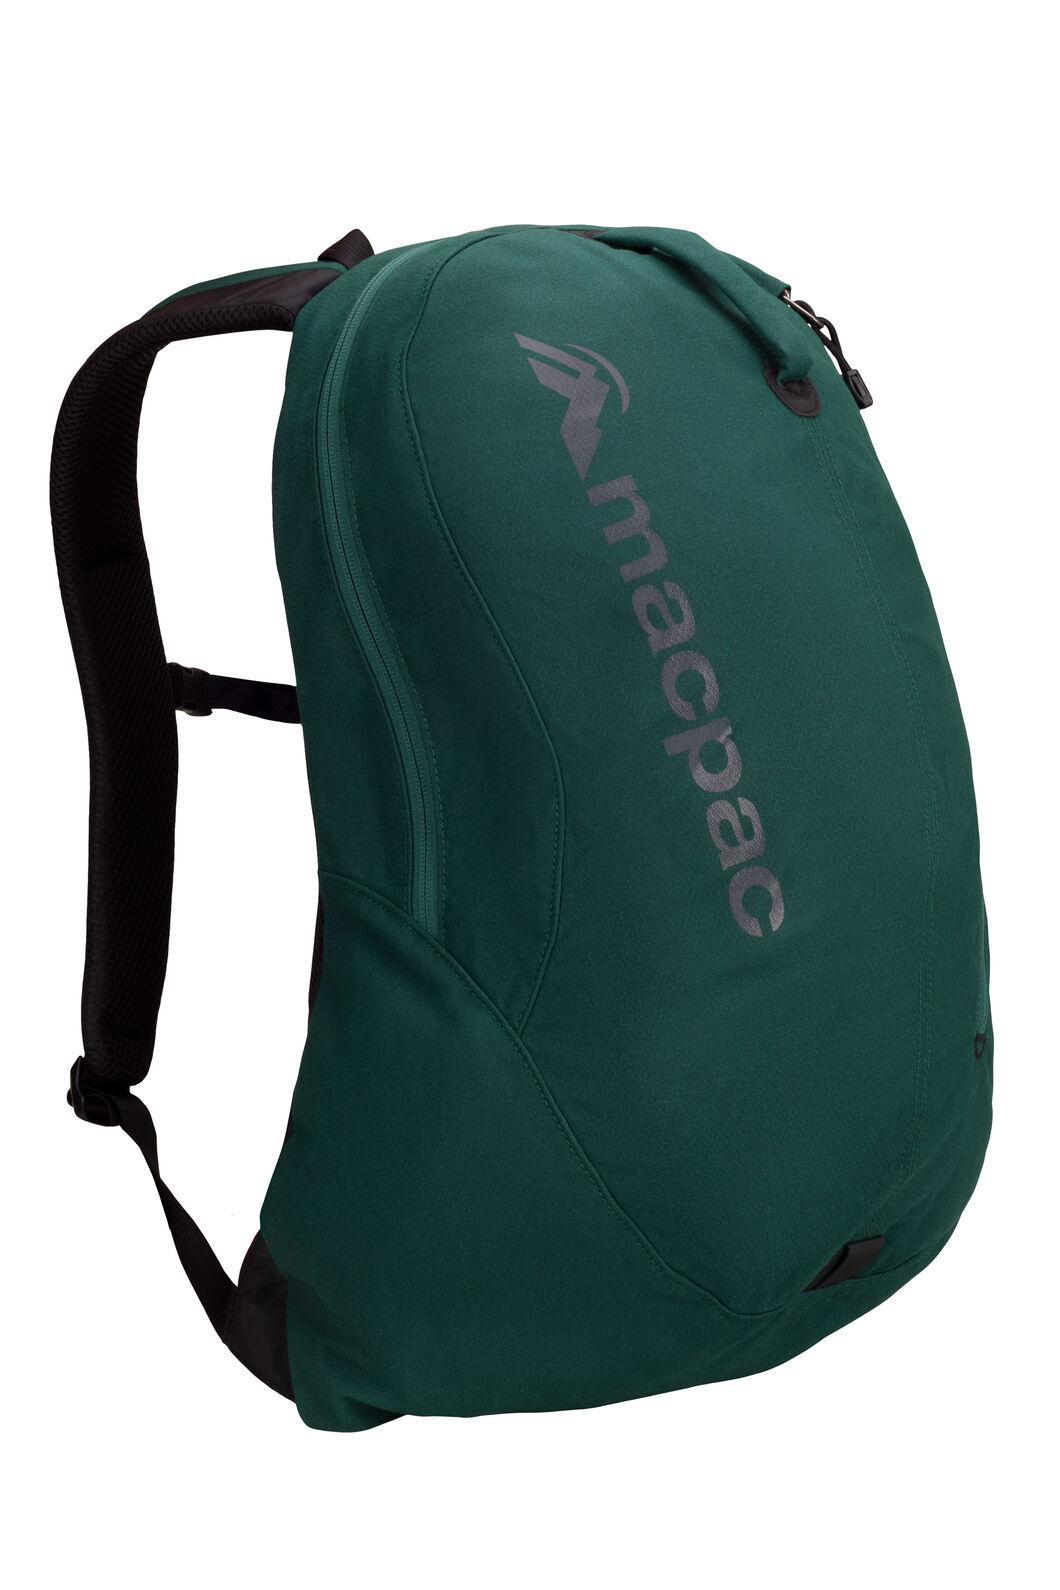 Macpac Kahu 22L AzTec® Backpack, Botanical Green/Black, hi-res